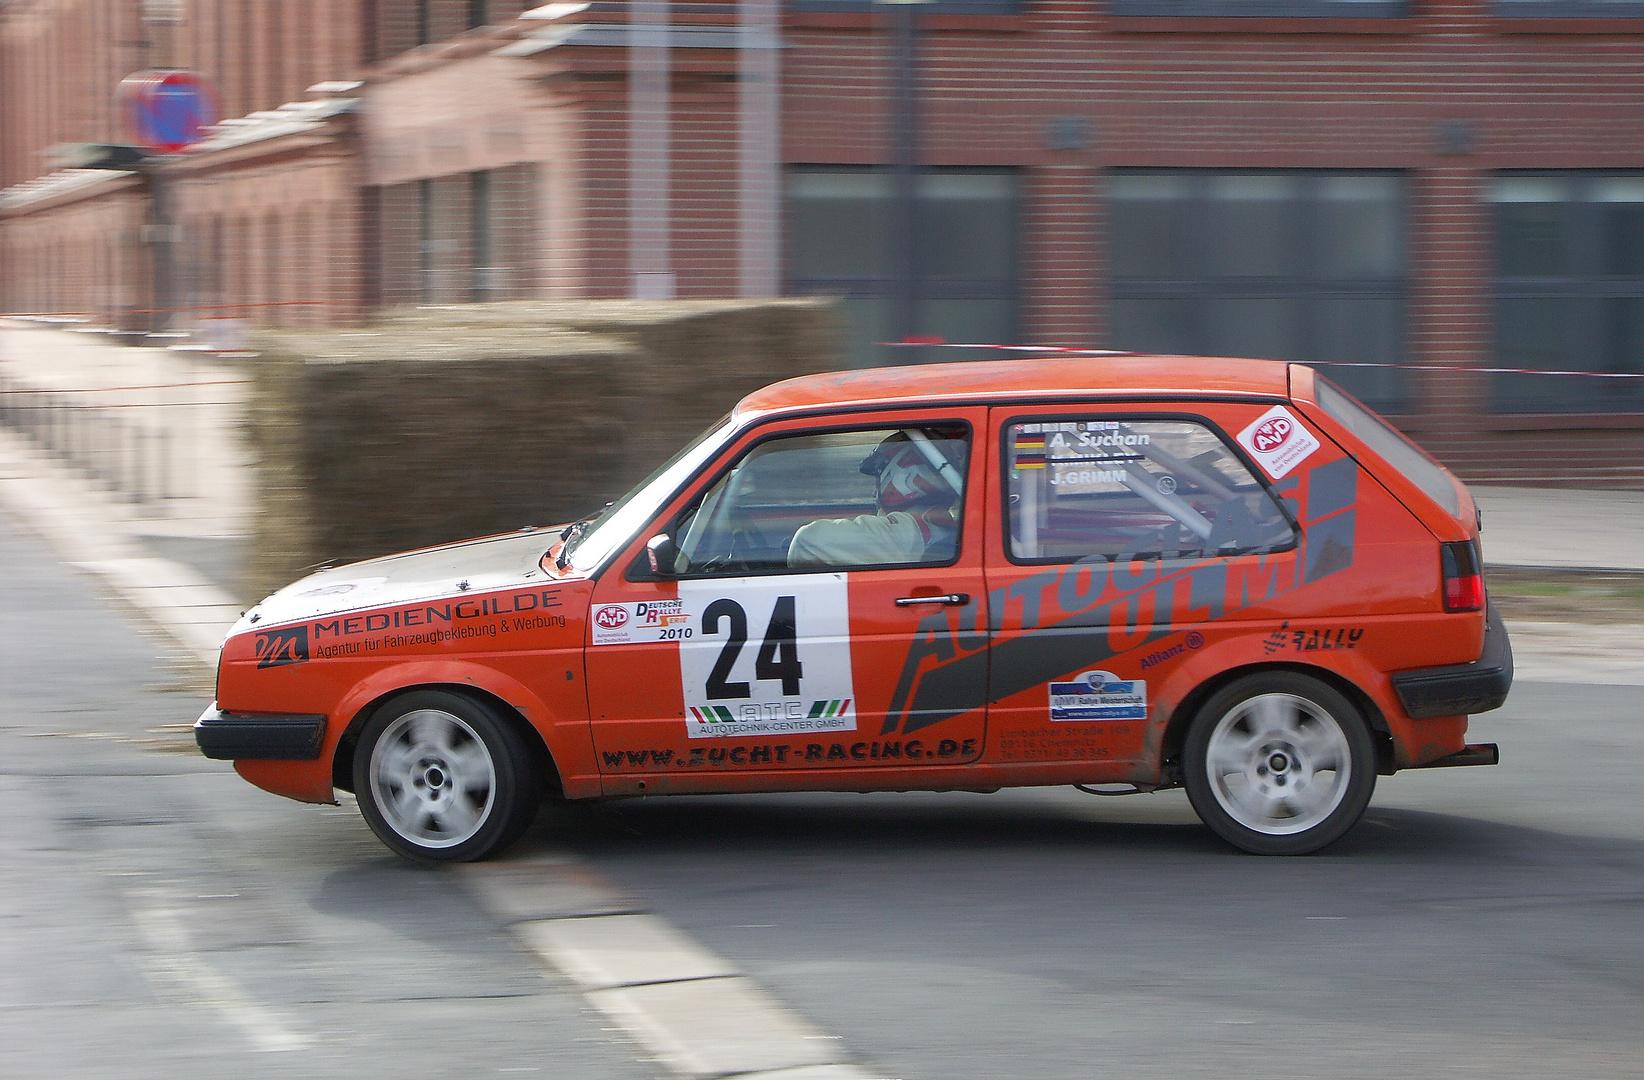 Rally Zwickauer Land, VW